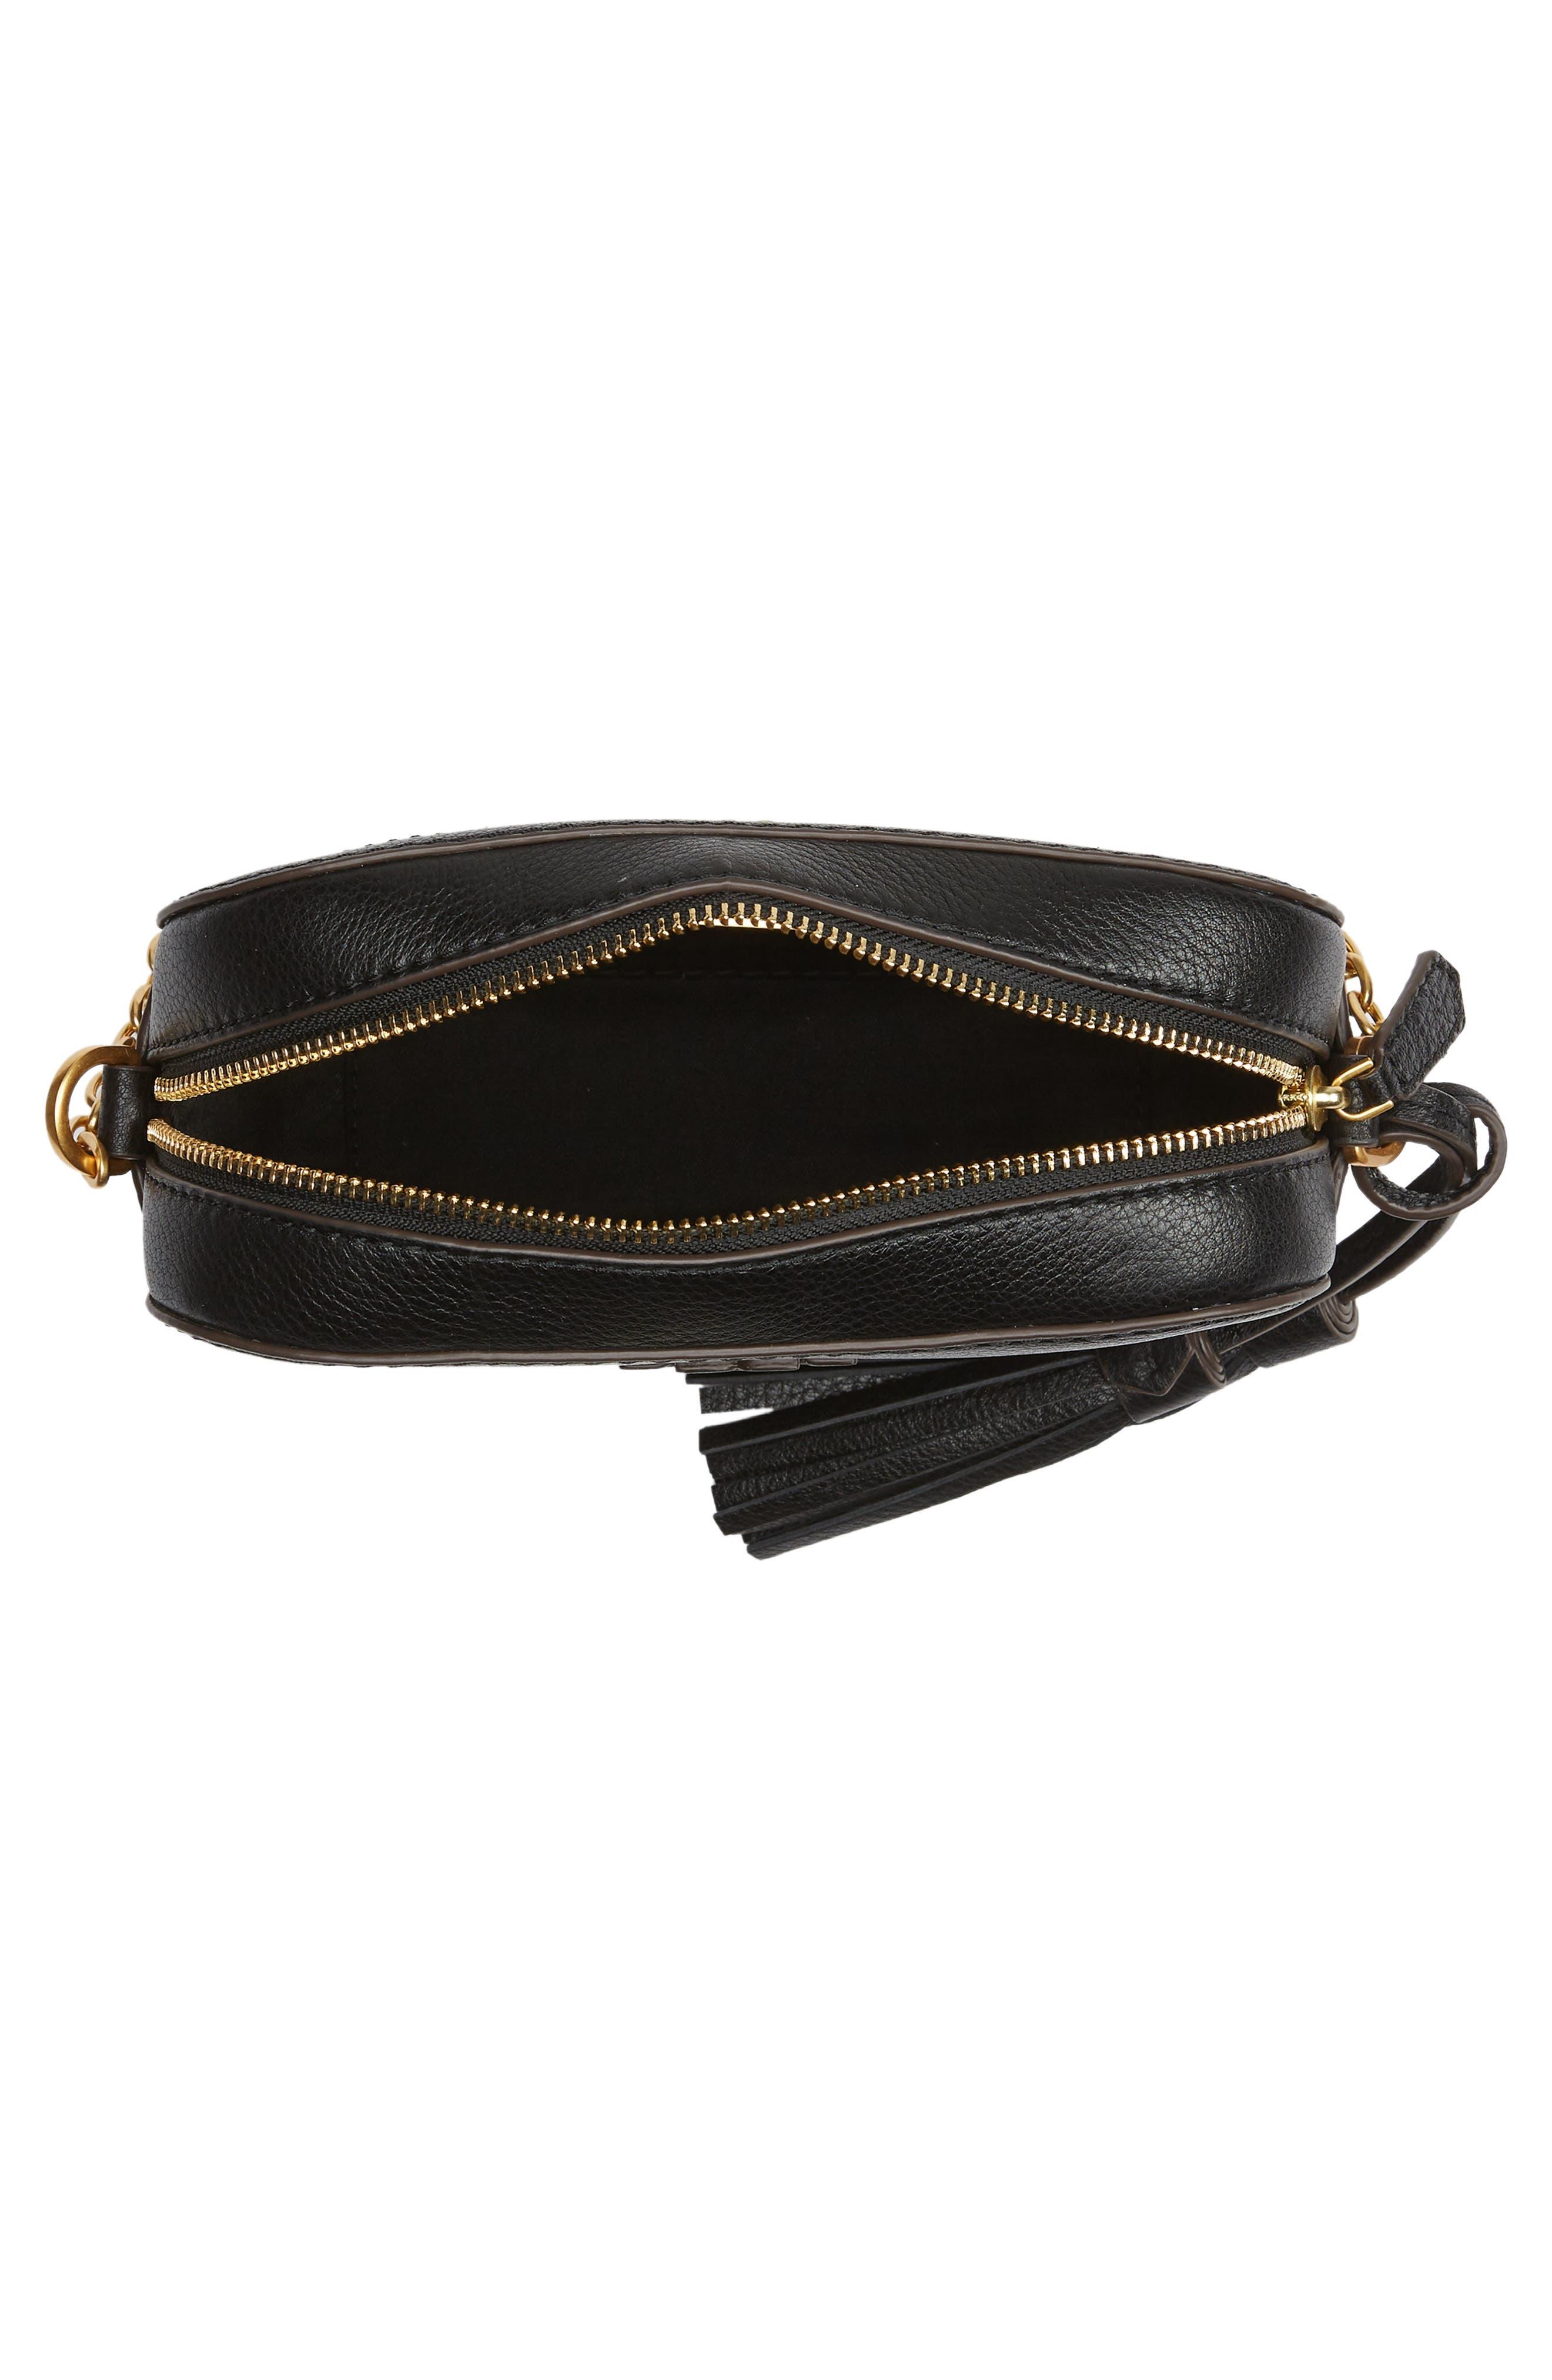 McGraw Leather Camera Bag,                             Alternate thumbnail 4, color,                             BLACK